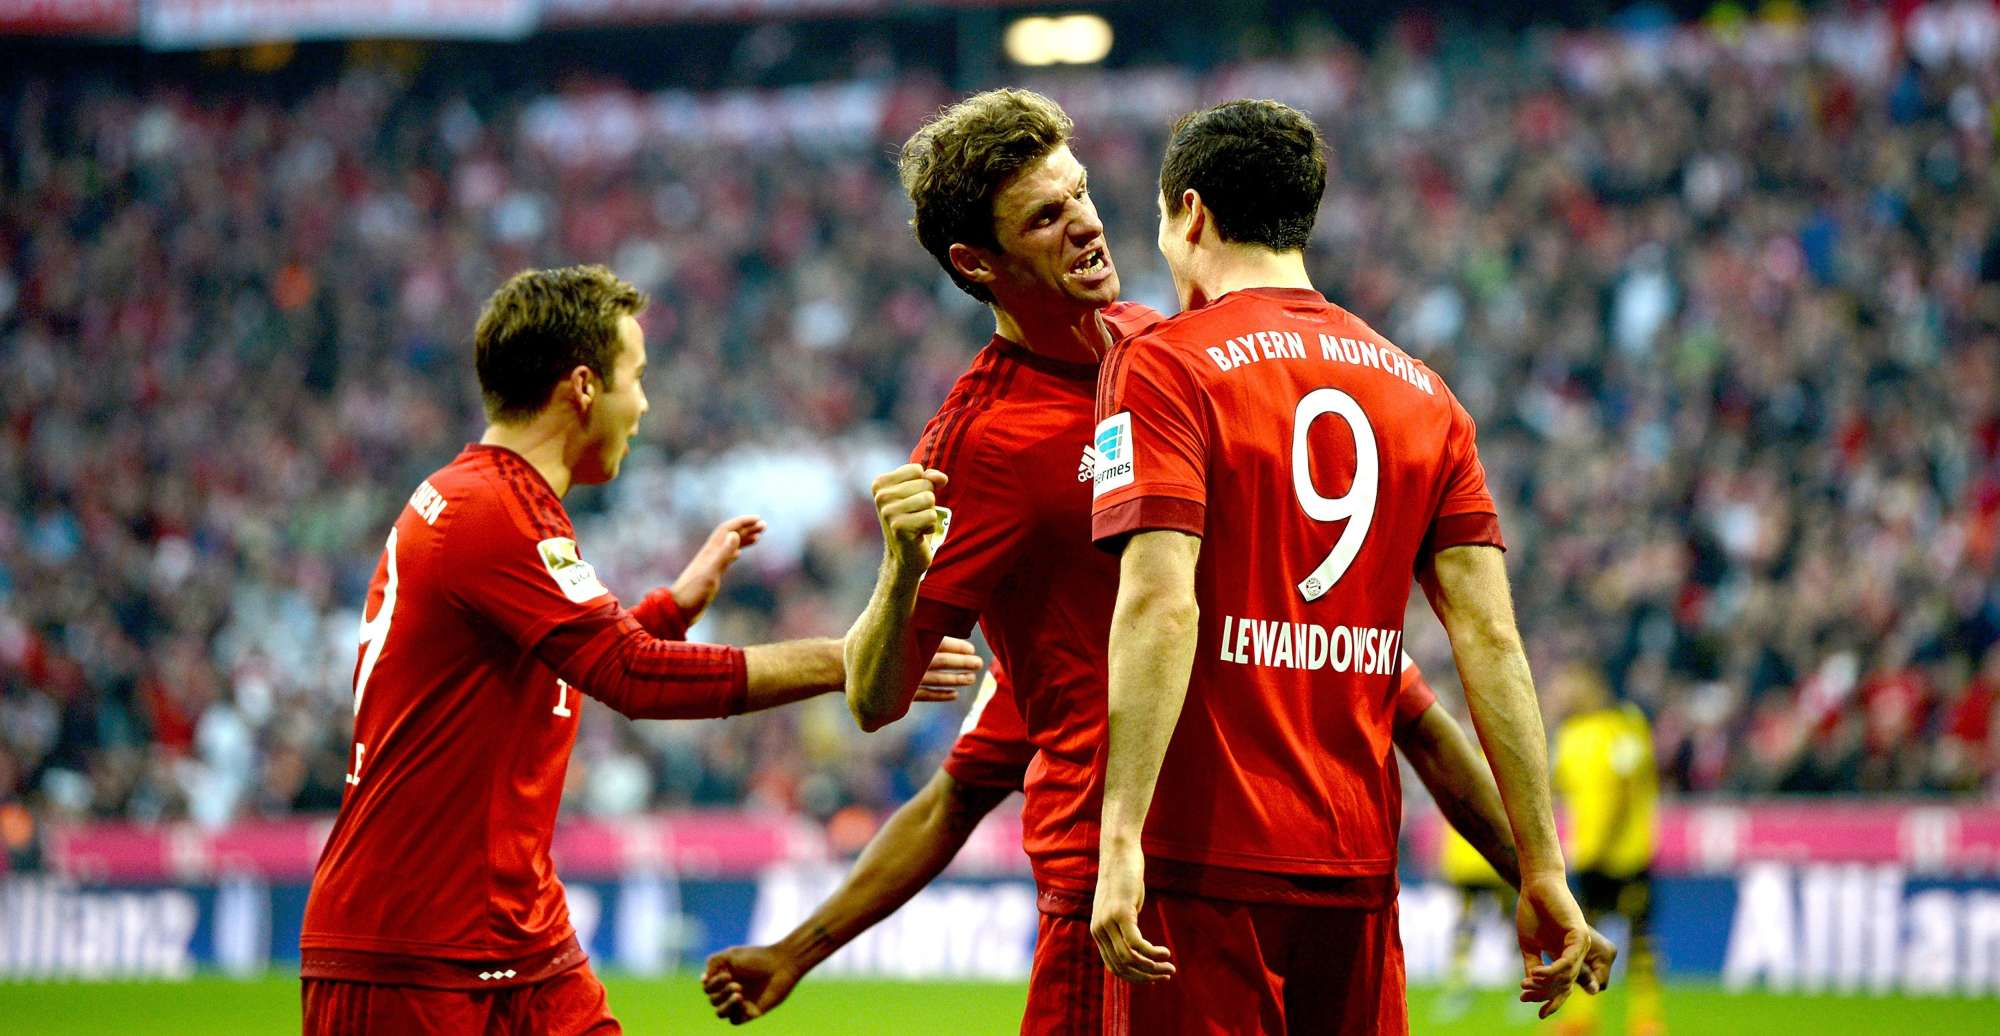 Muller e Lewandowski; compagni nel Bayern, avversari a Euro 2016